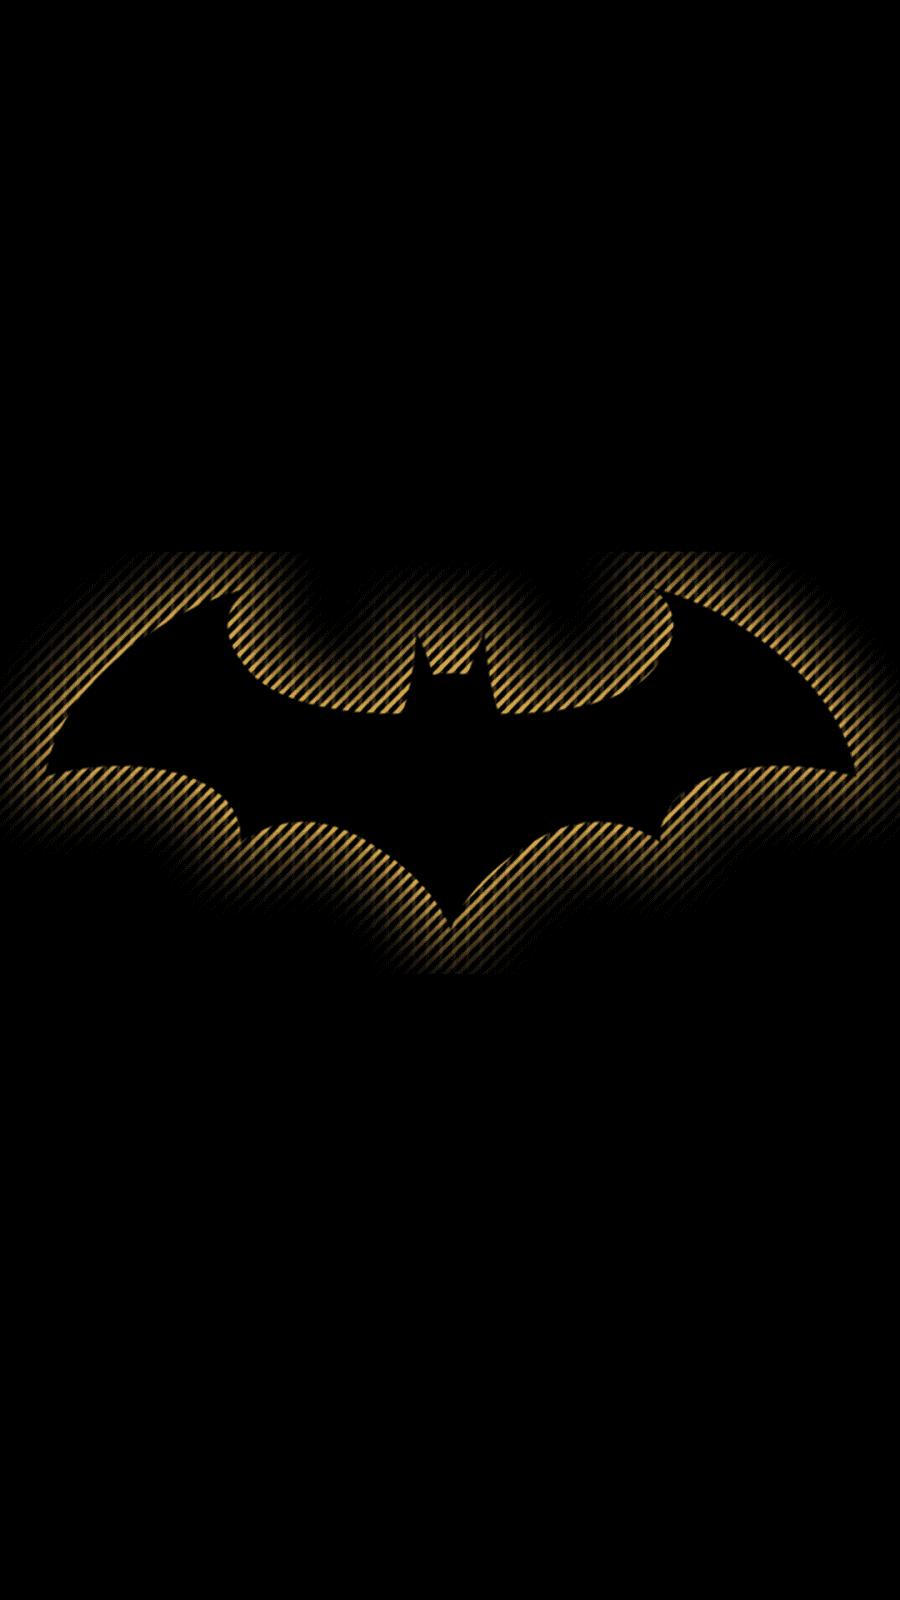 S7 Edge Batman Wallpaper Vinny Oleo Vegetal Info